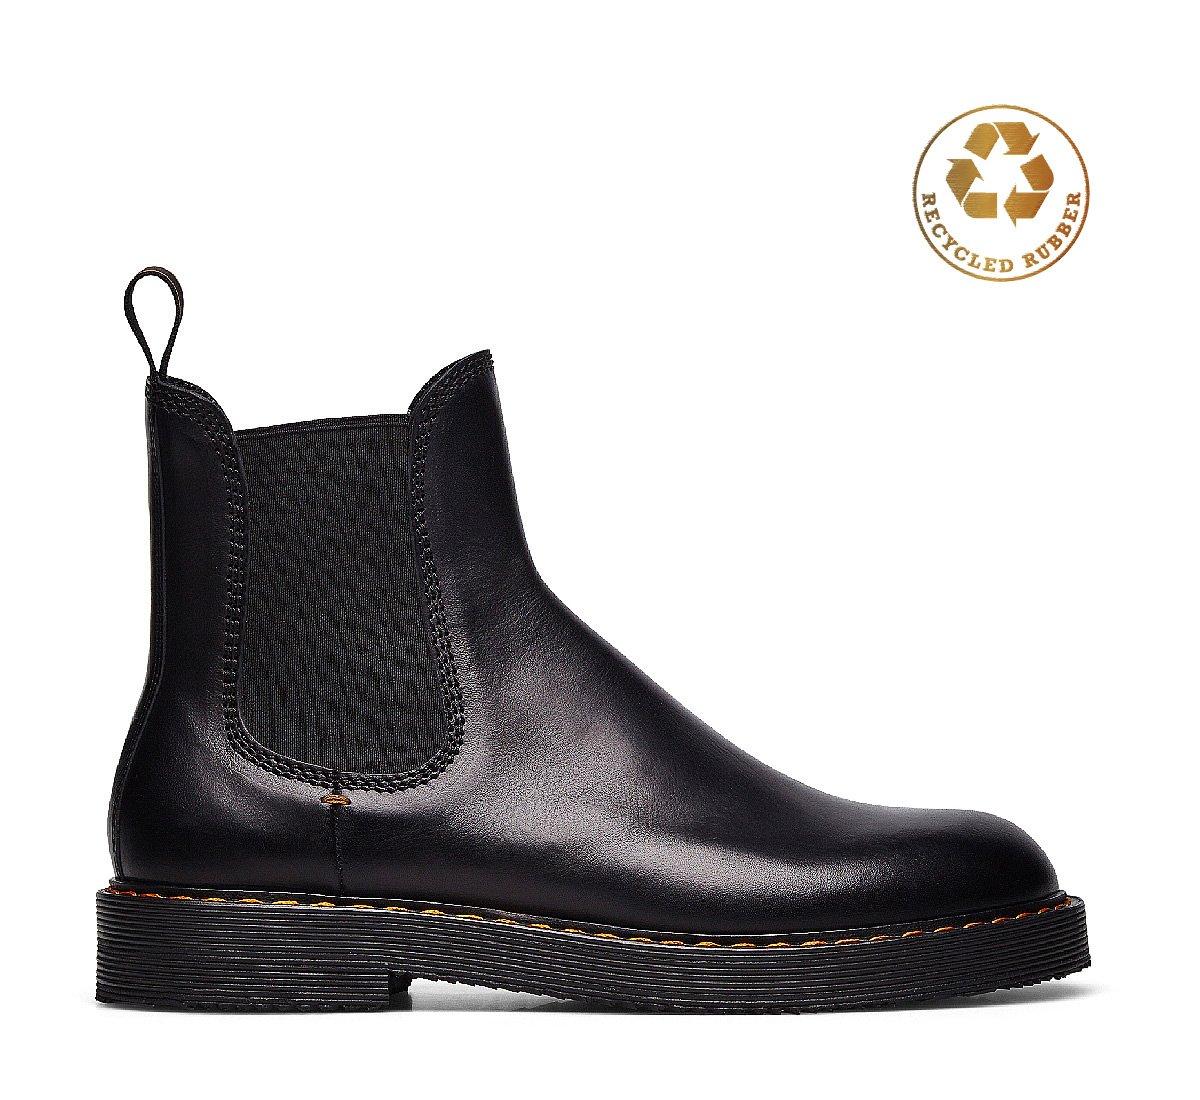 Barracuda calfskin Beatle boots